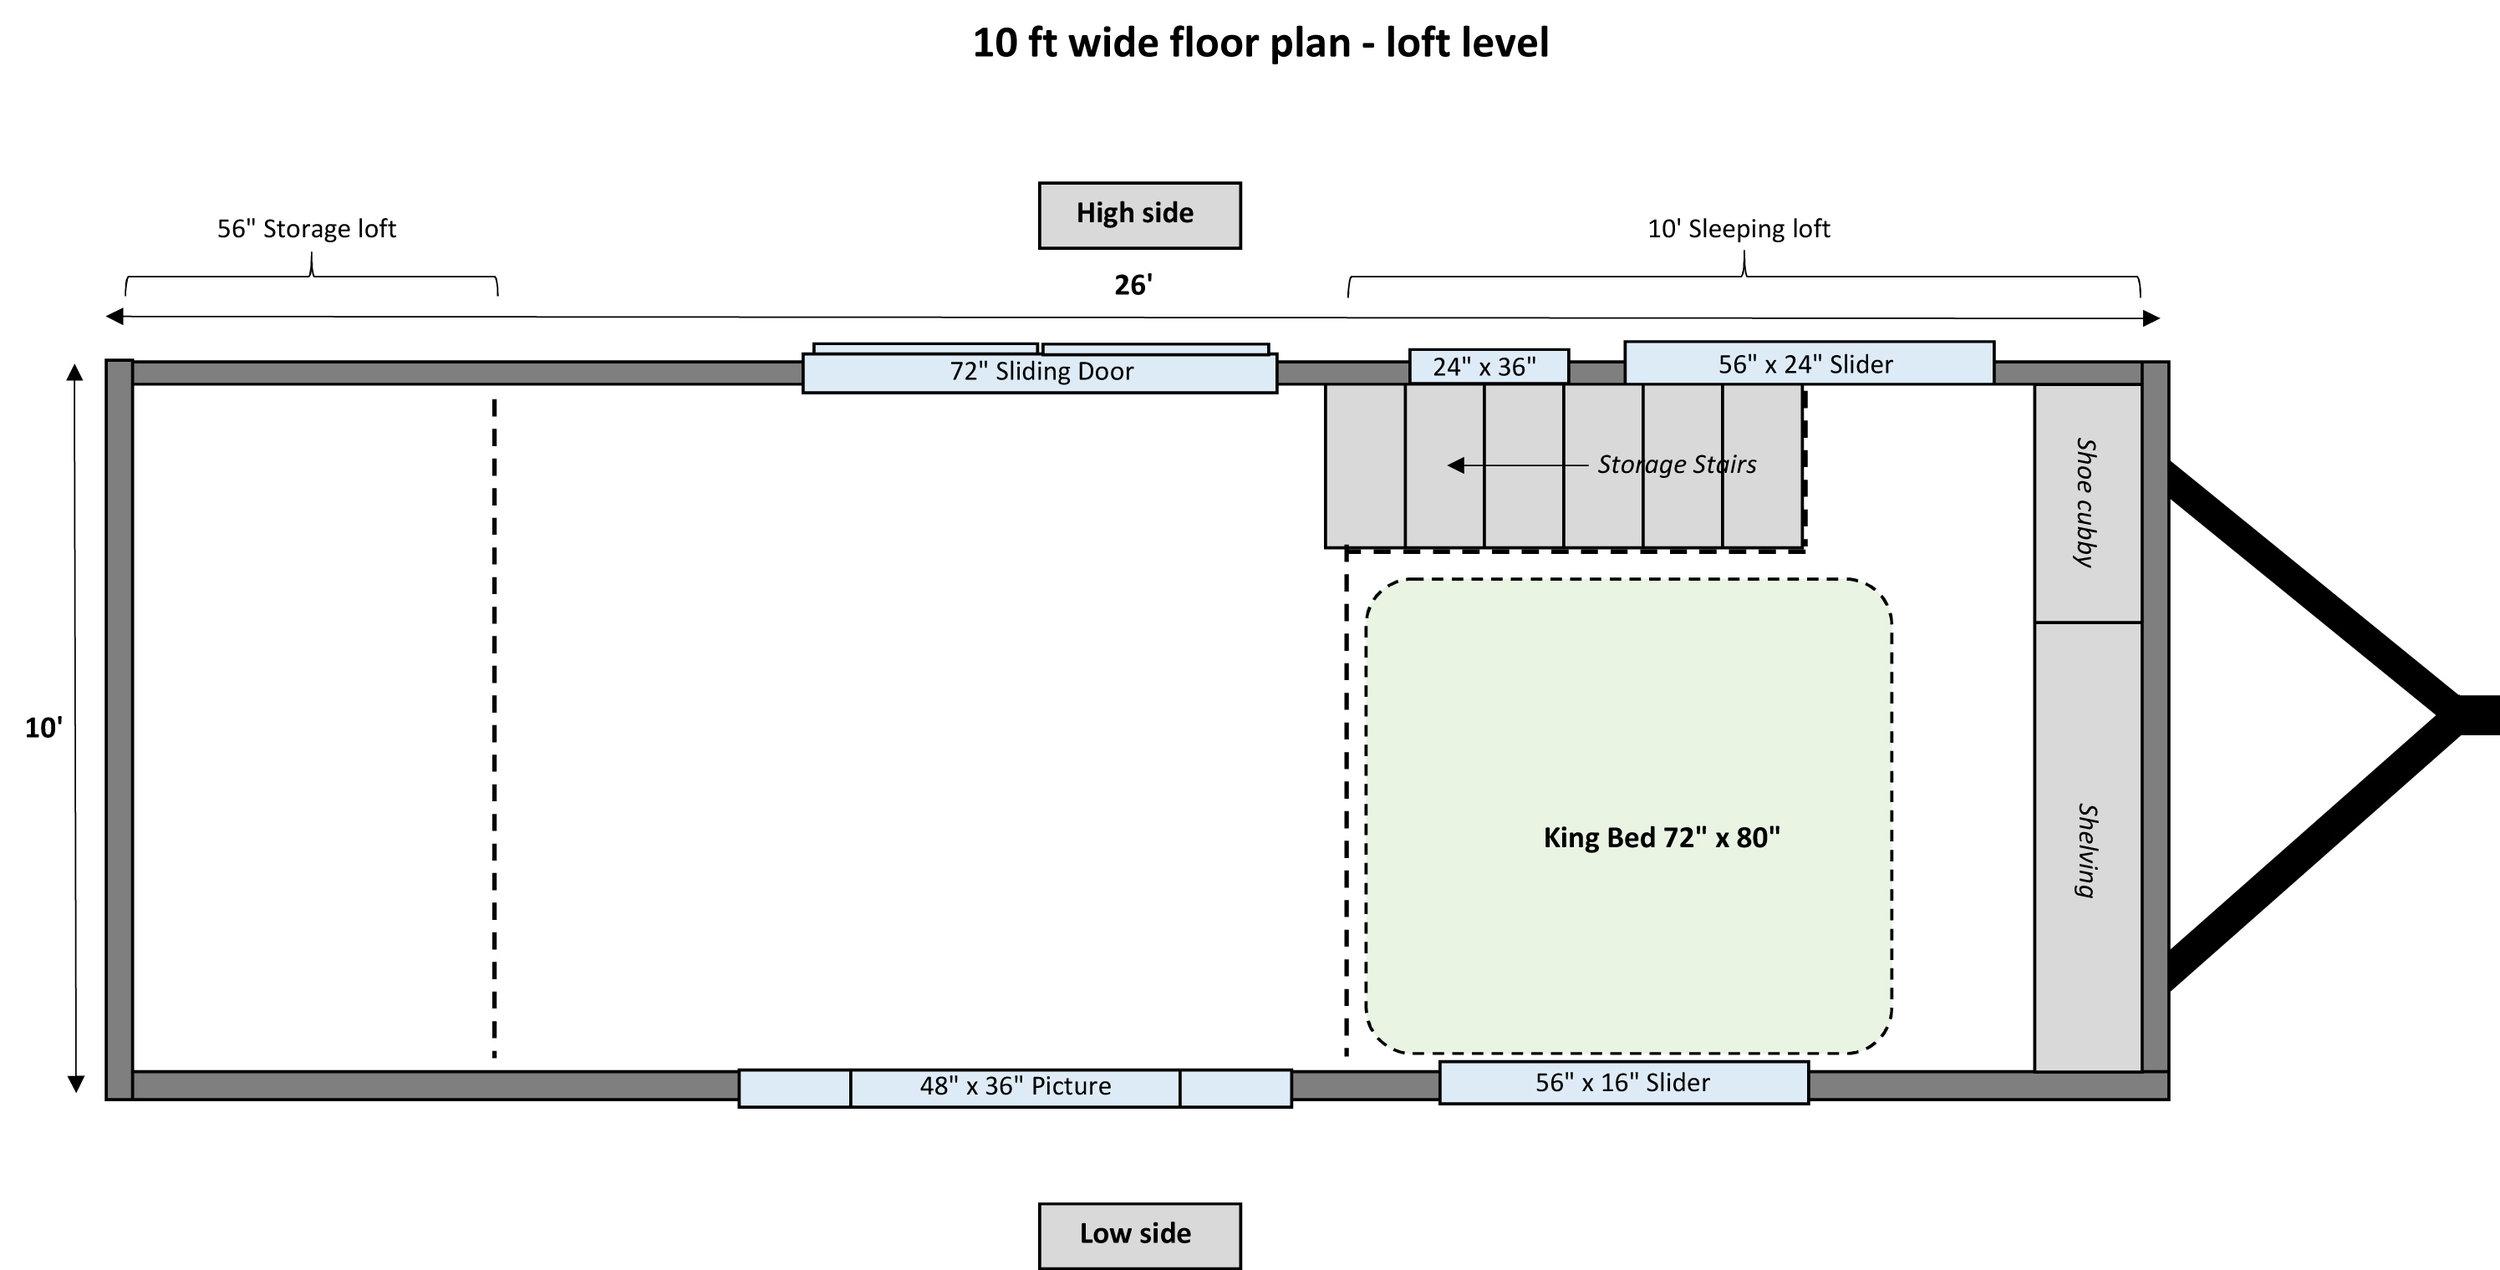 10 foot wide floor plan - loft level.jpg